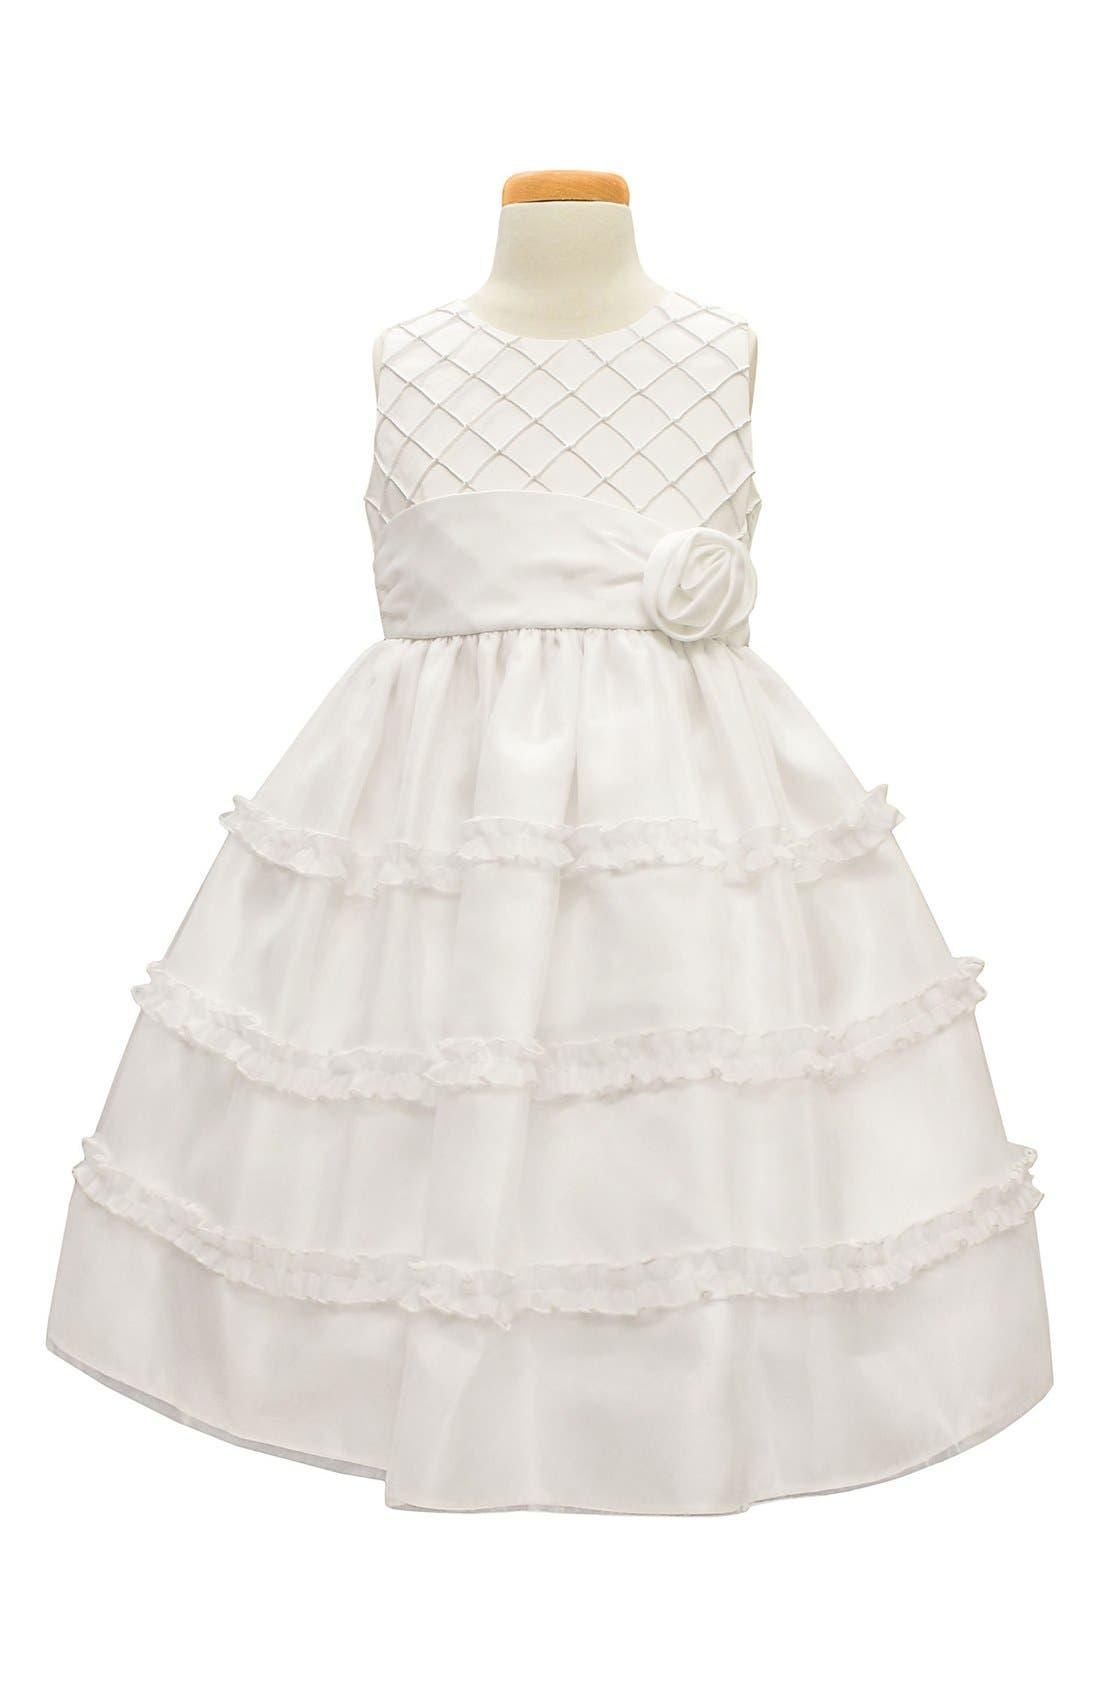 SORBET, Diamond Pleated Satin & Organza Dress, Main thumbnail 1, color, WHITE